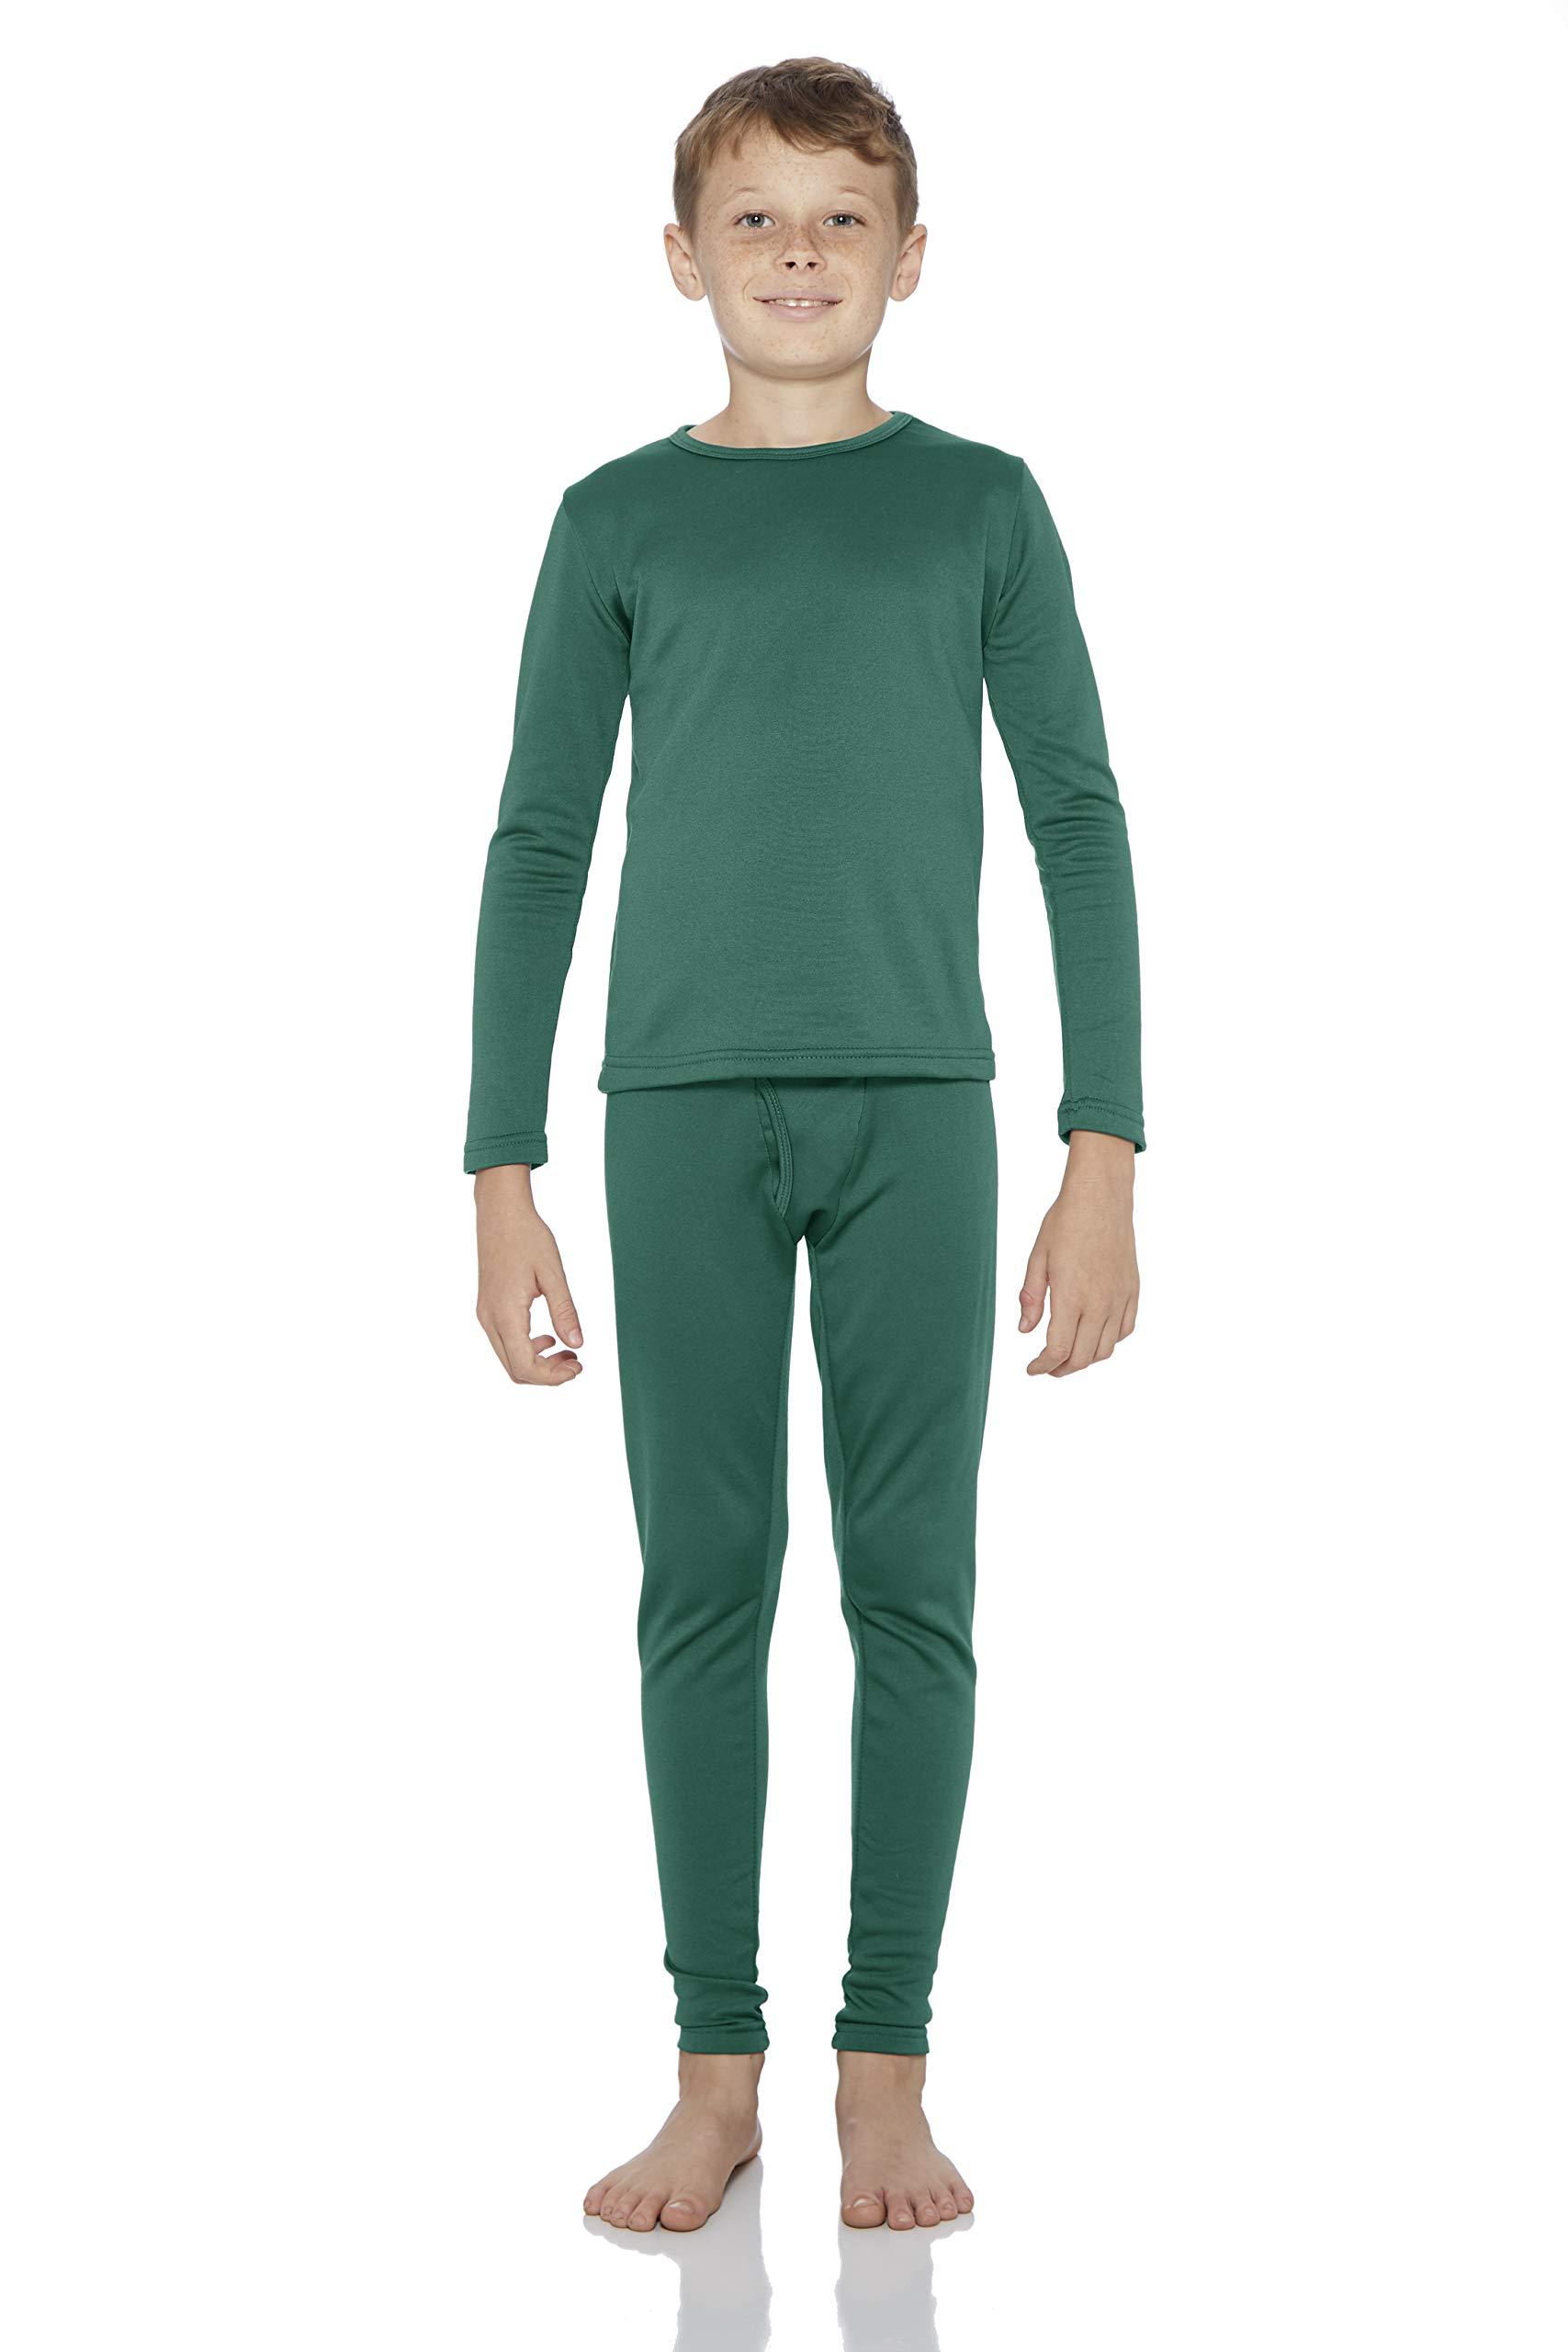 Rocky Boy's Fleece Lined Thermal Underwear 2PC Set Long John Top and Bottom (XS, Jade)